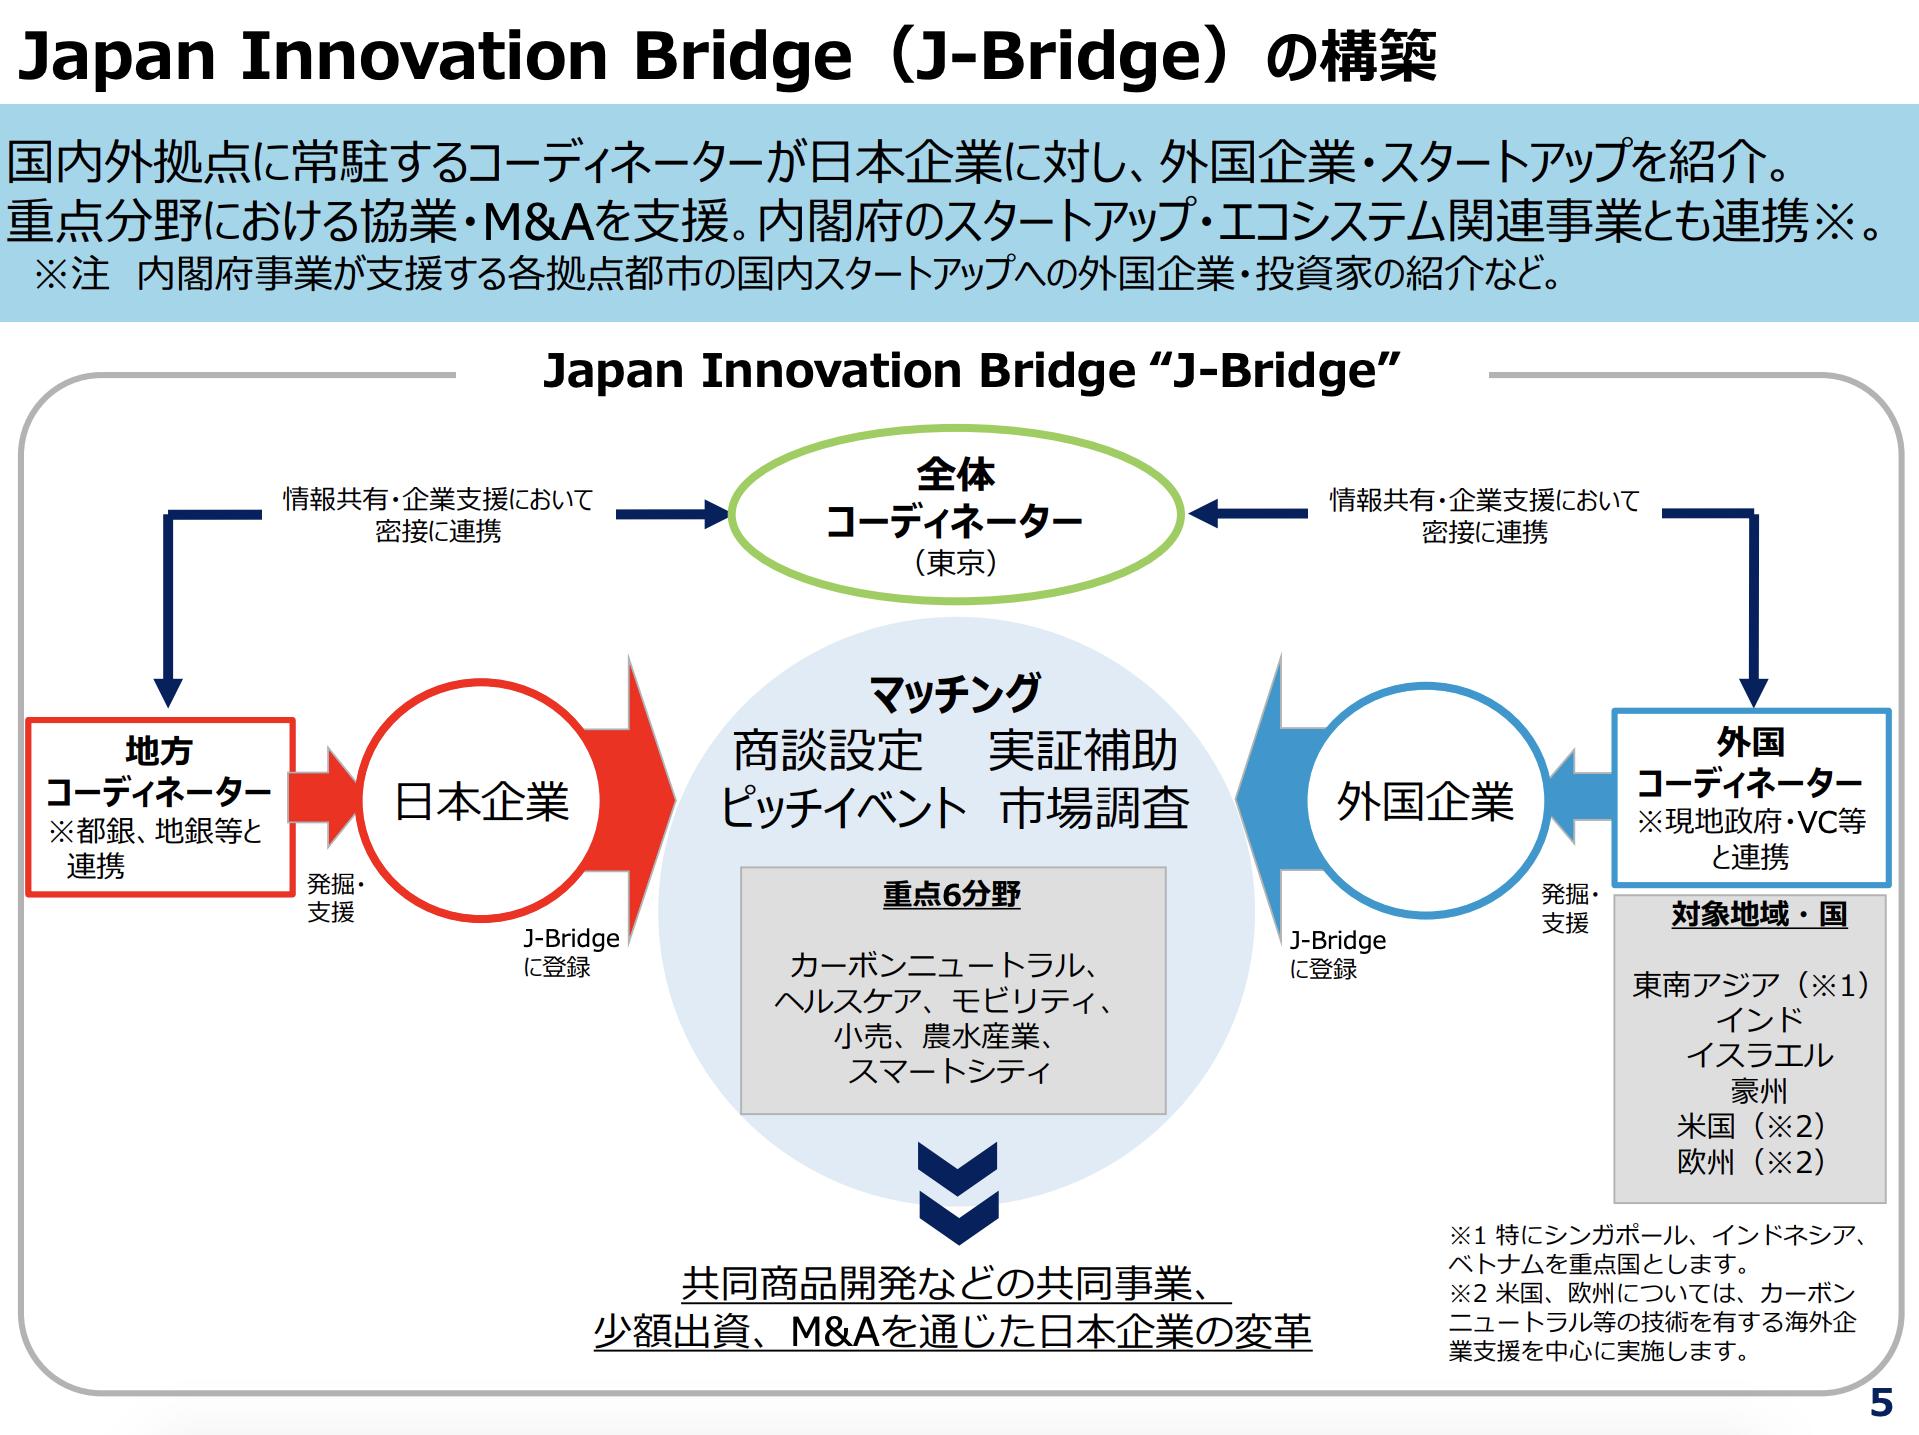 Japan Innovation Bridgeの構造